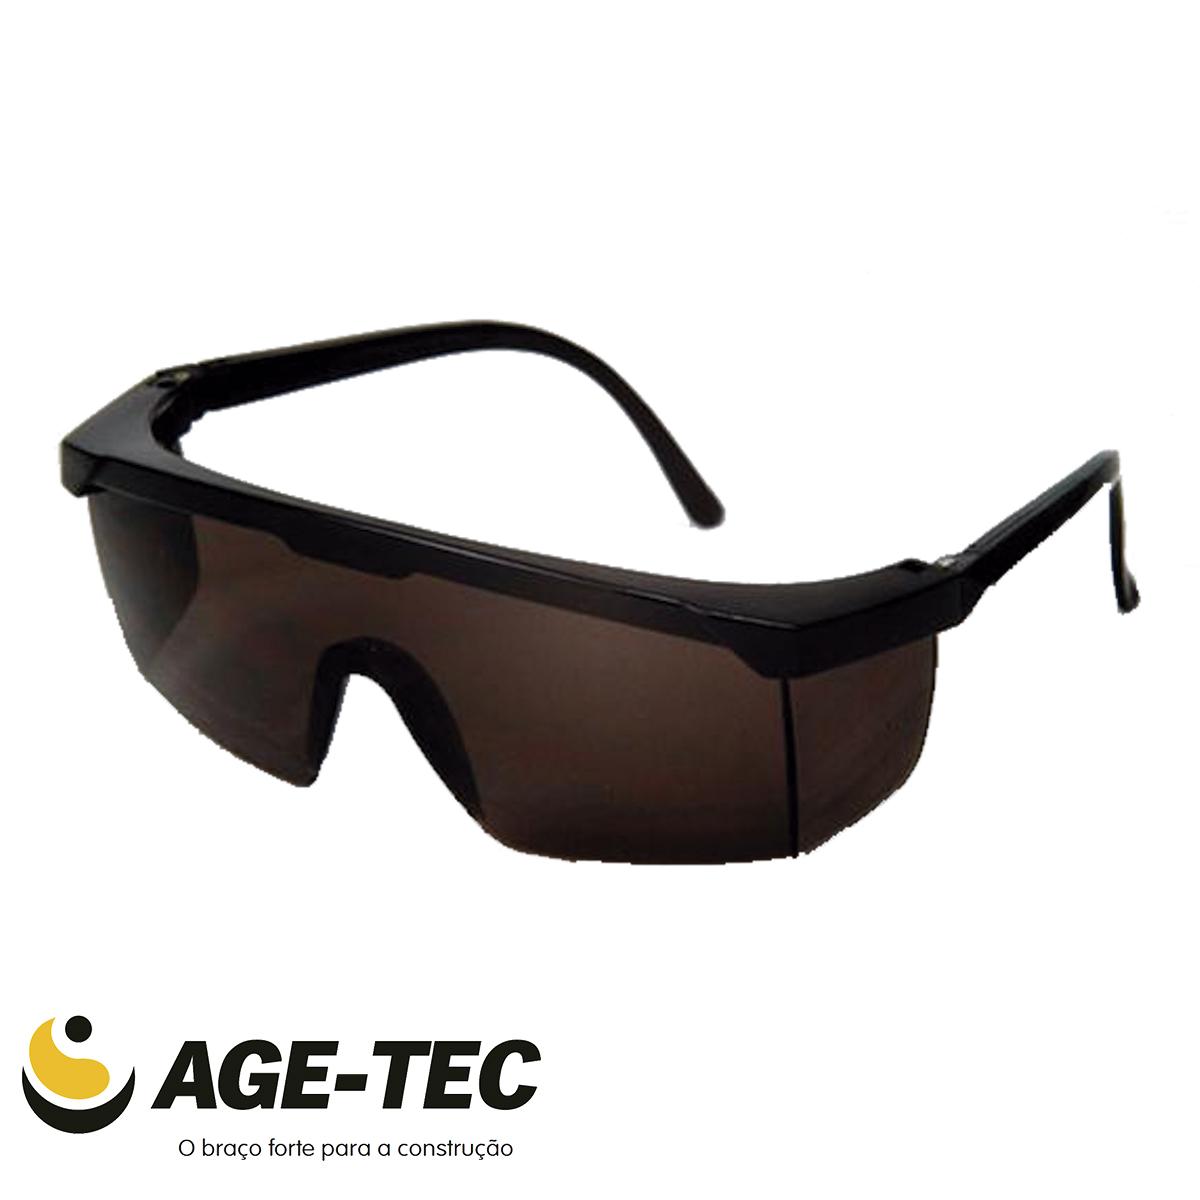 c2c4f49c3b18b Óculos de Segurança Cinza Jaguar - KALIPSO